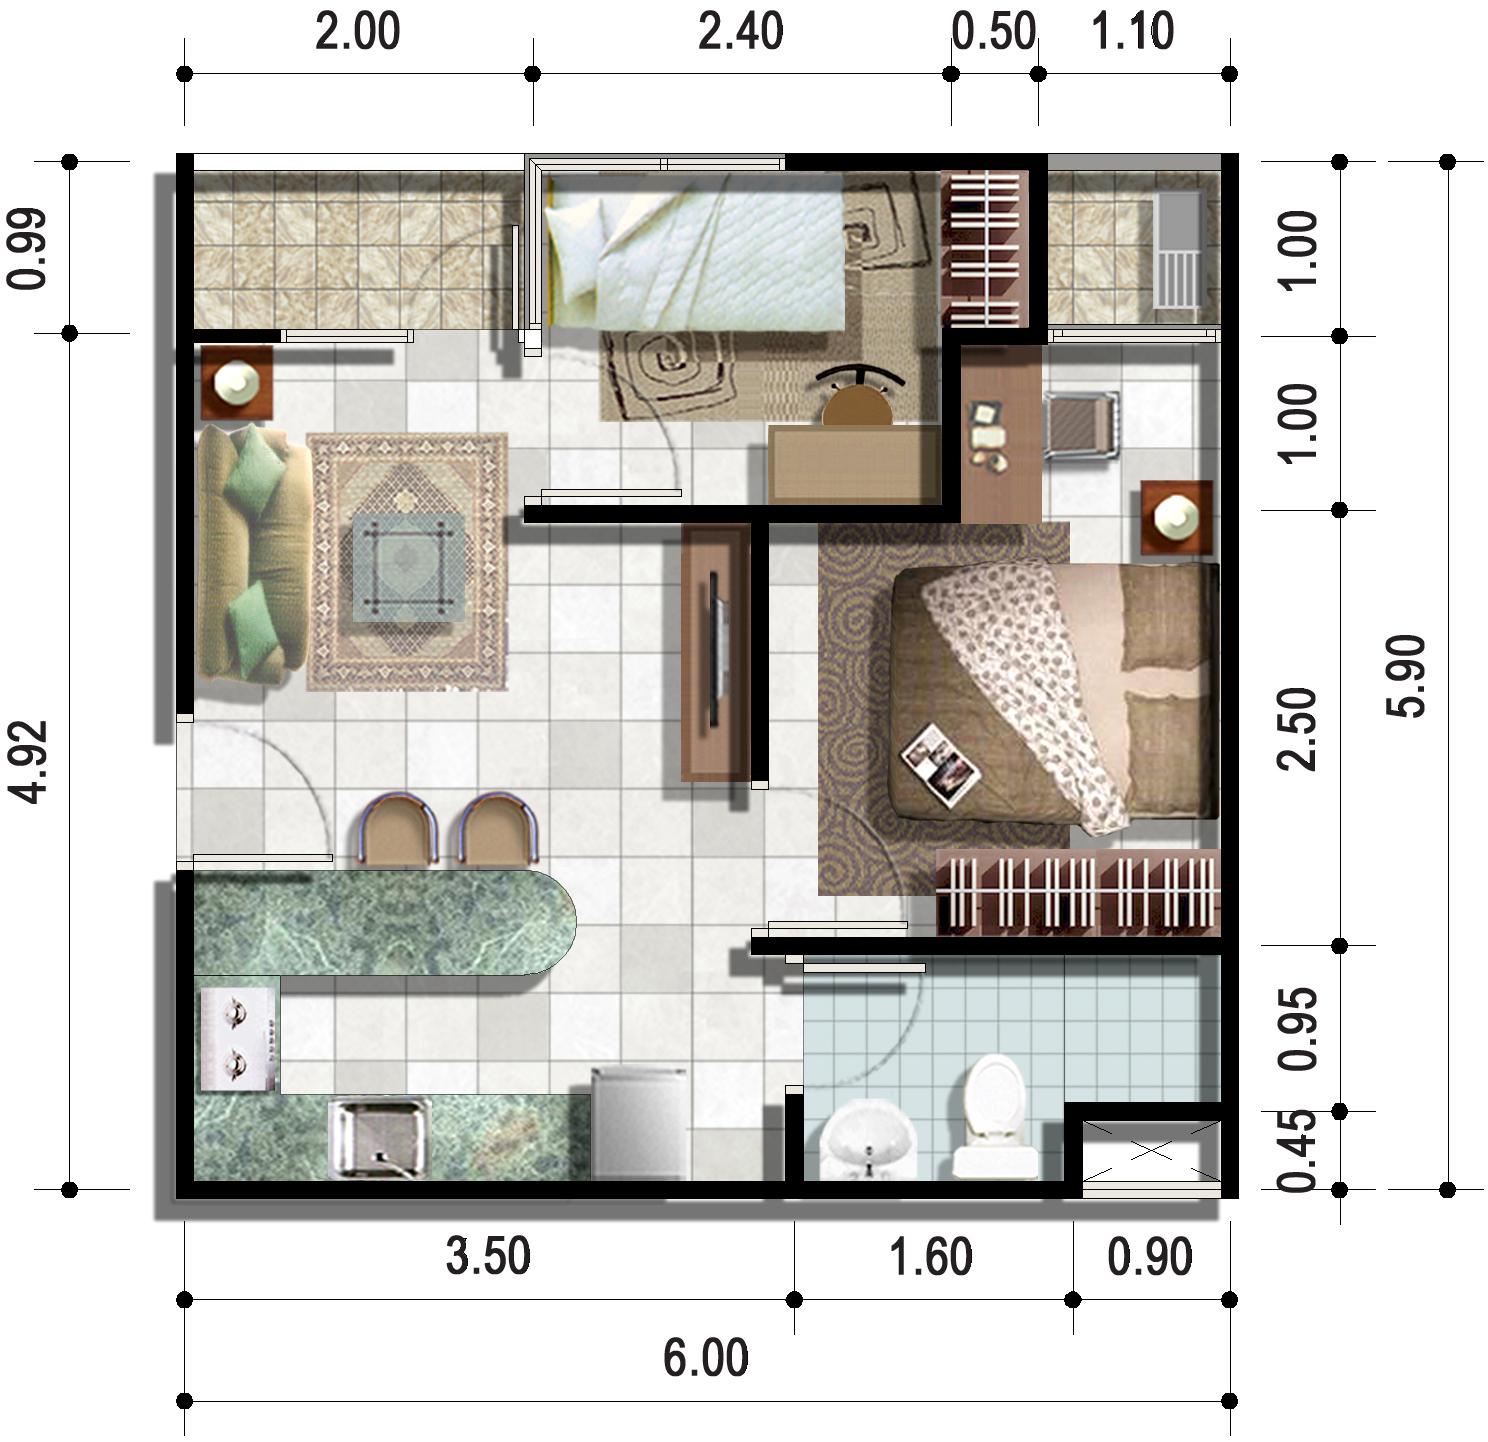 Apartemen paragon square for Design apartemen 2 kamar tidur